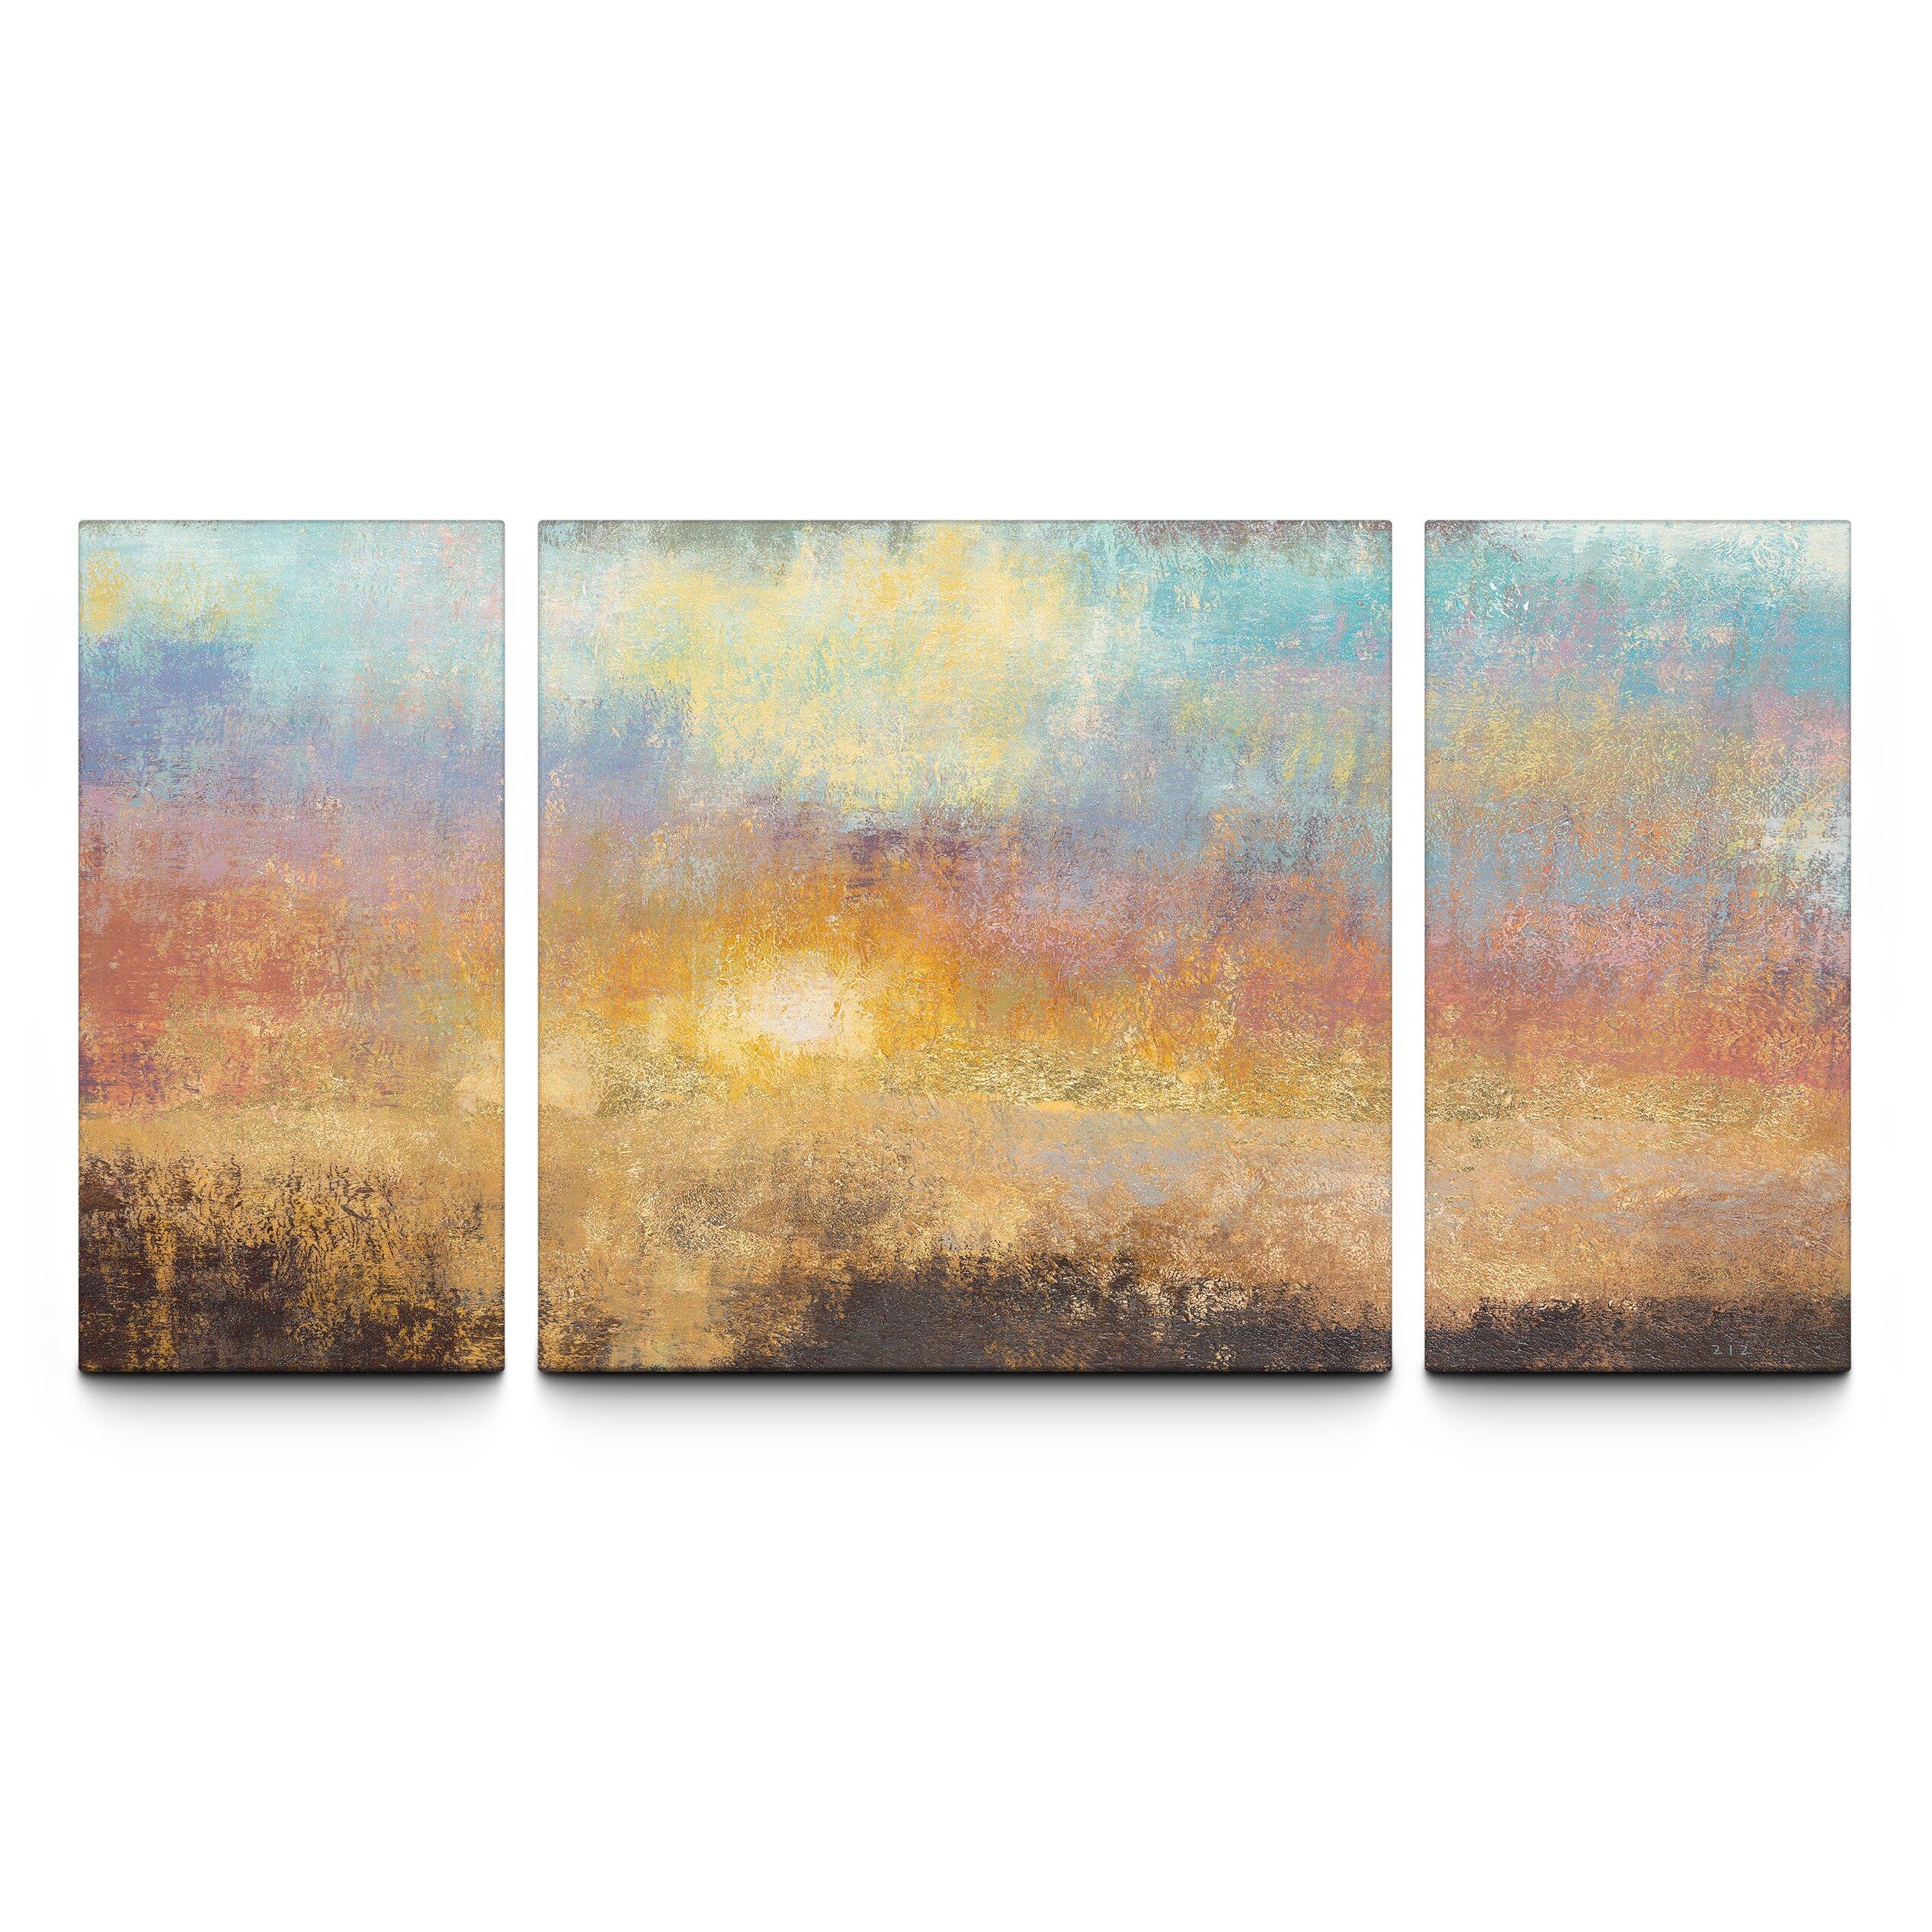 Artefx Decor Paradise Sunset Textured Triptych By Studio 212 3 Piece Painting Print On Canvas